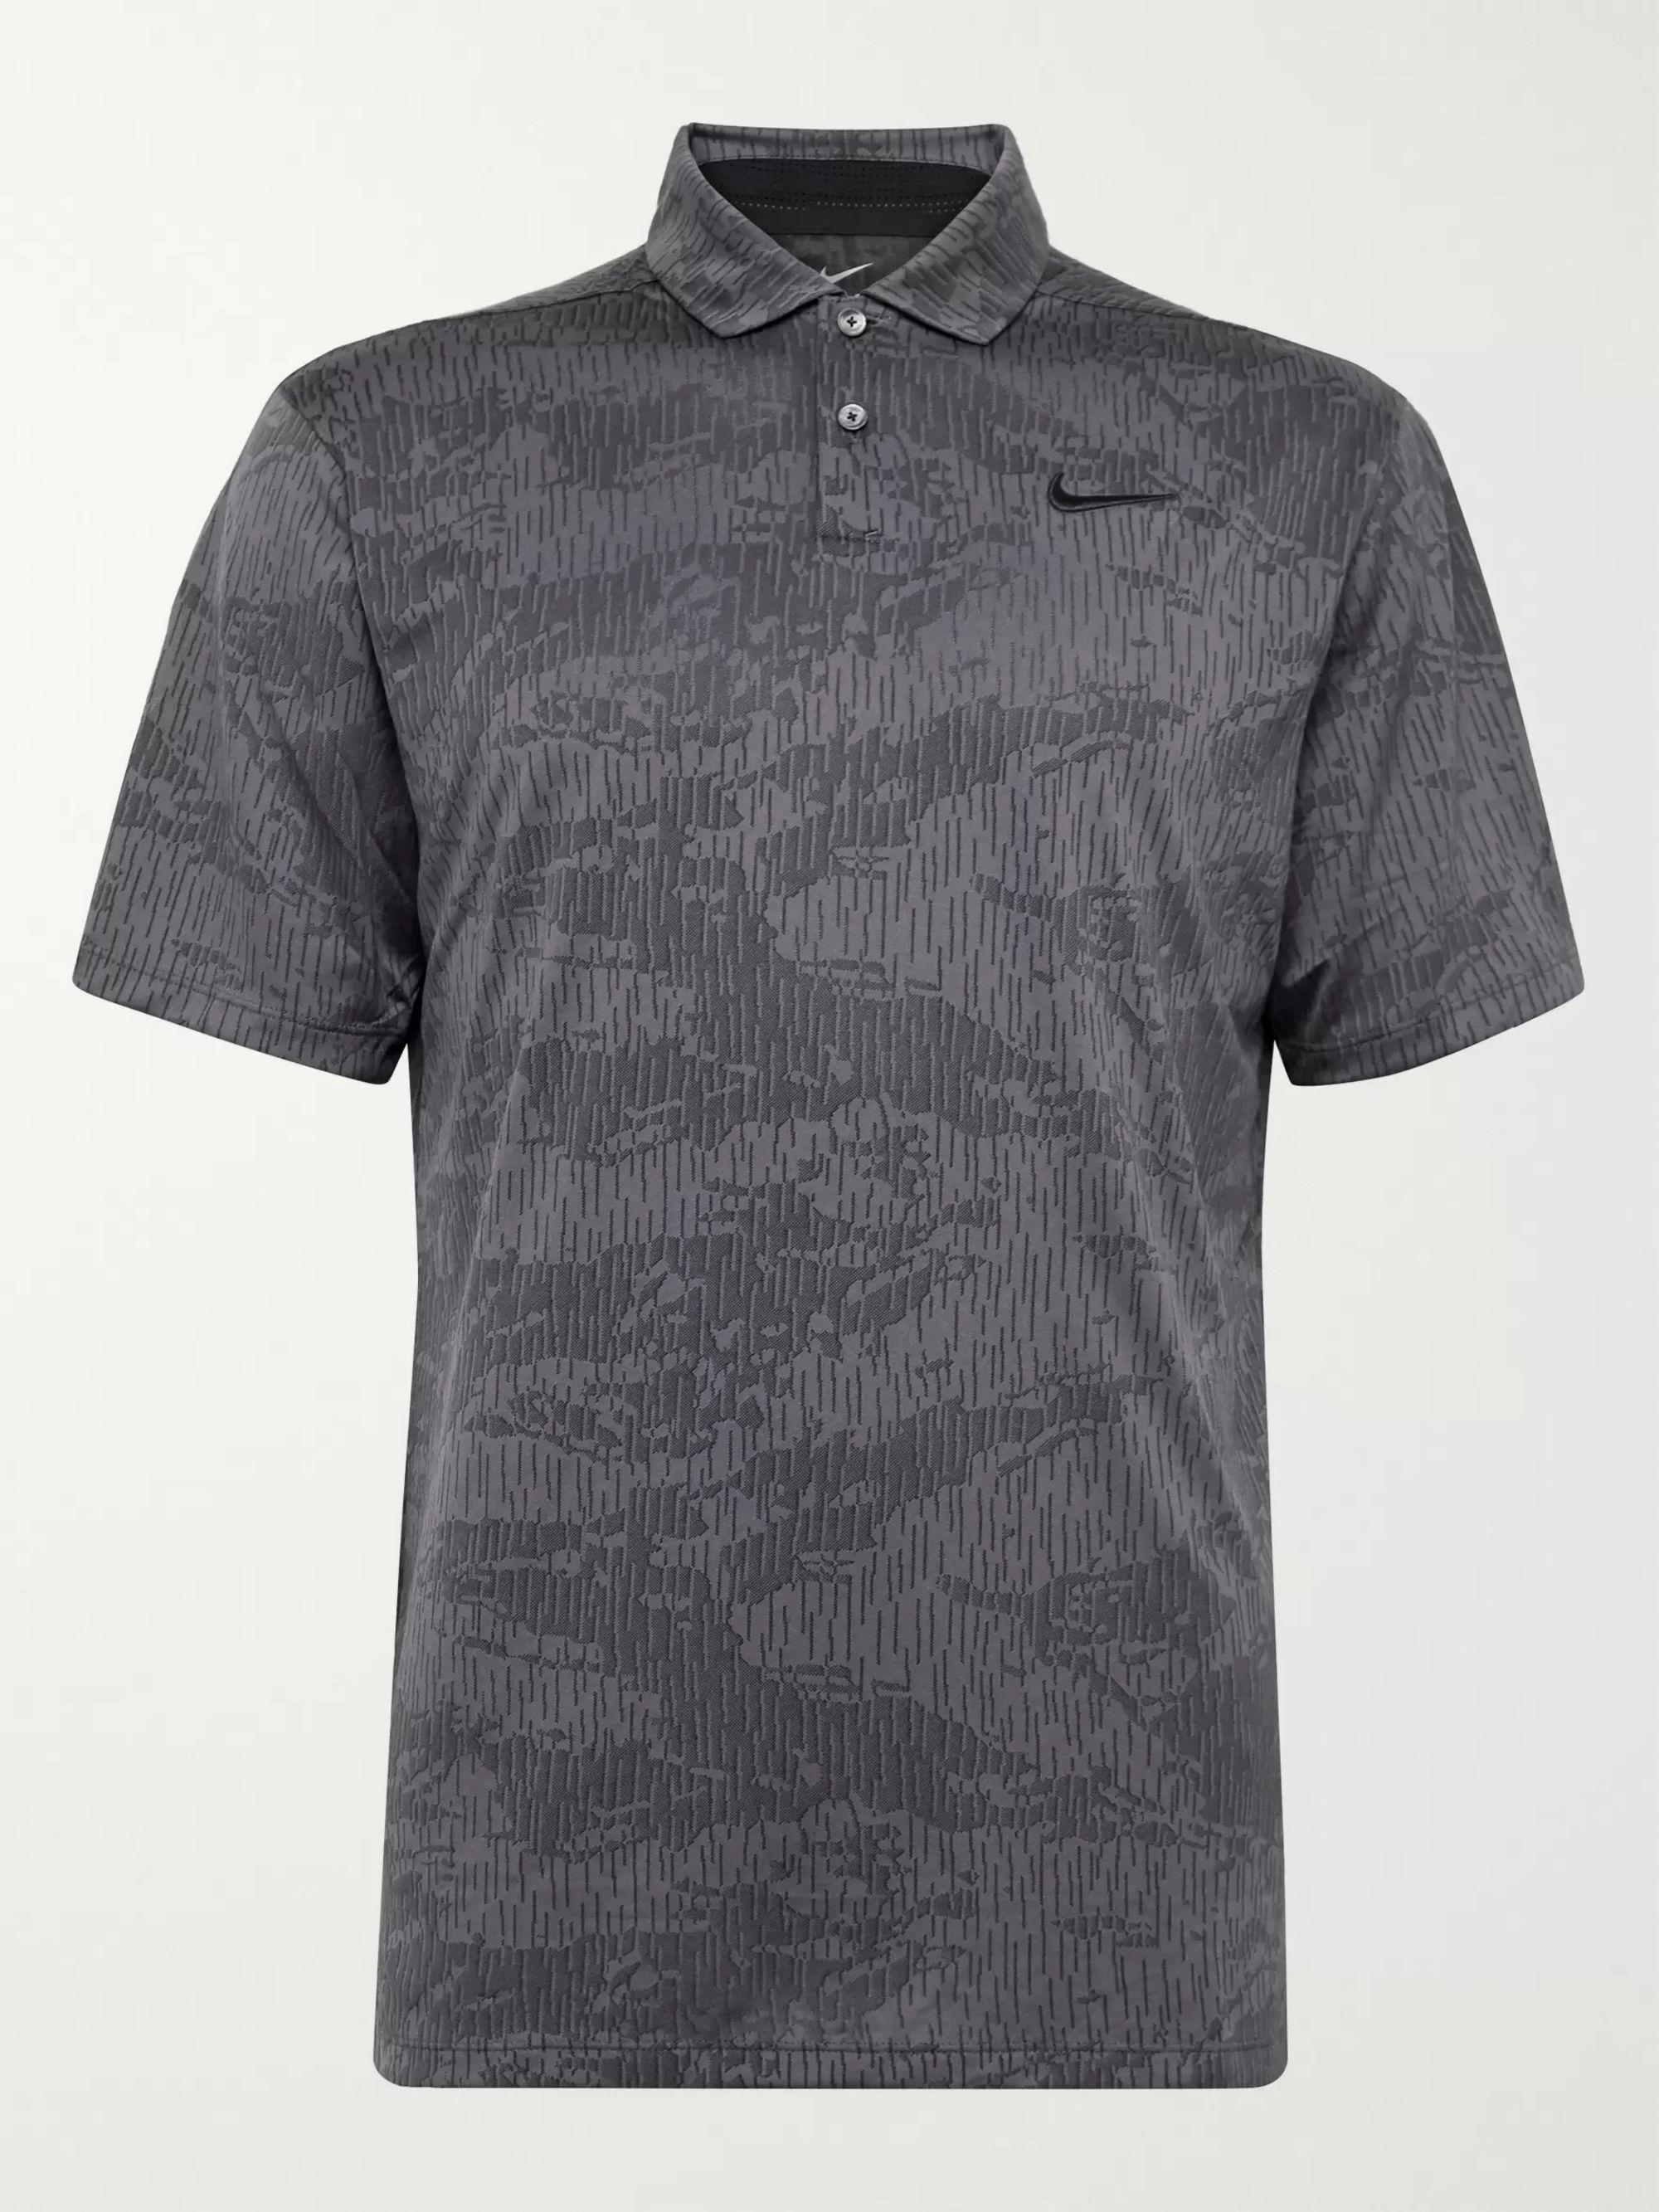 Nike Golf Vapor Camouflage-Jacquard Dri-FIT Polo Shirt